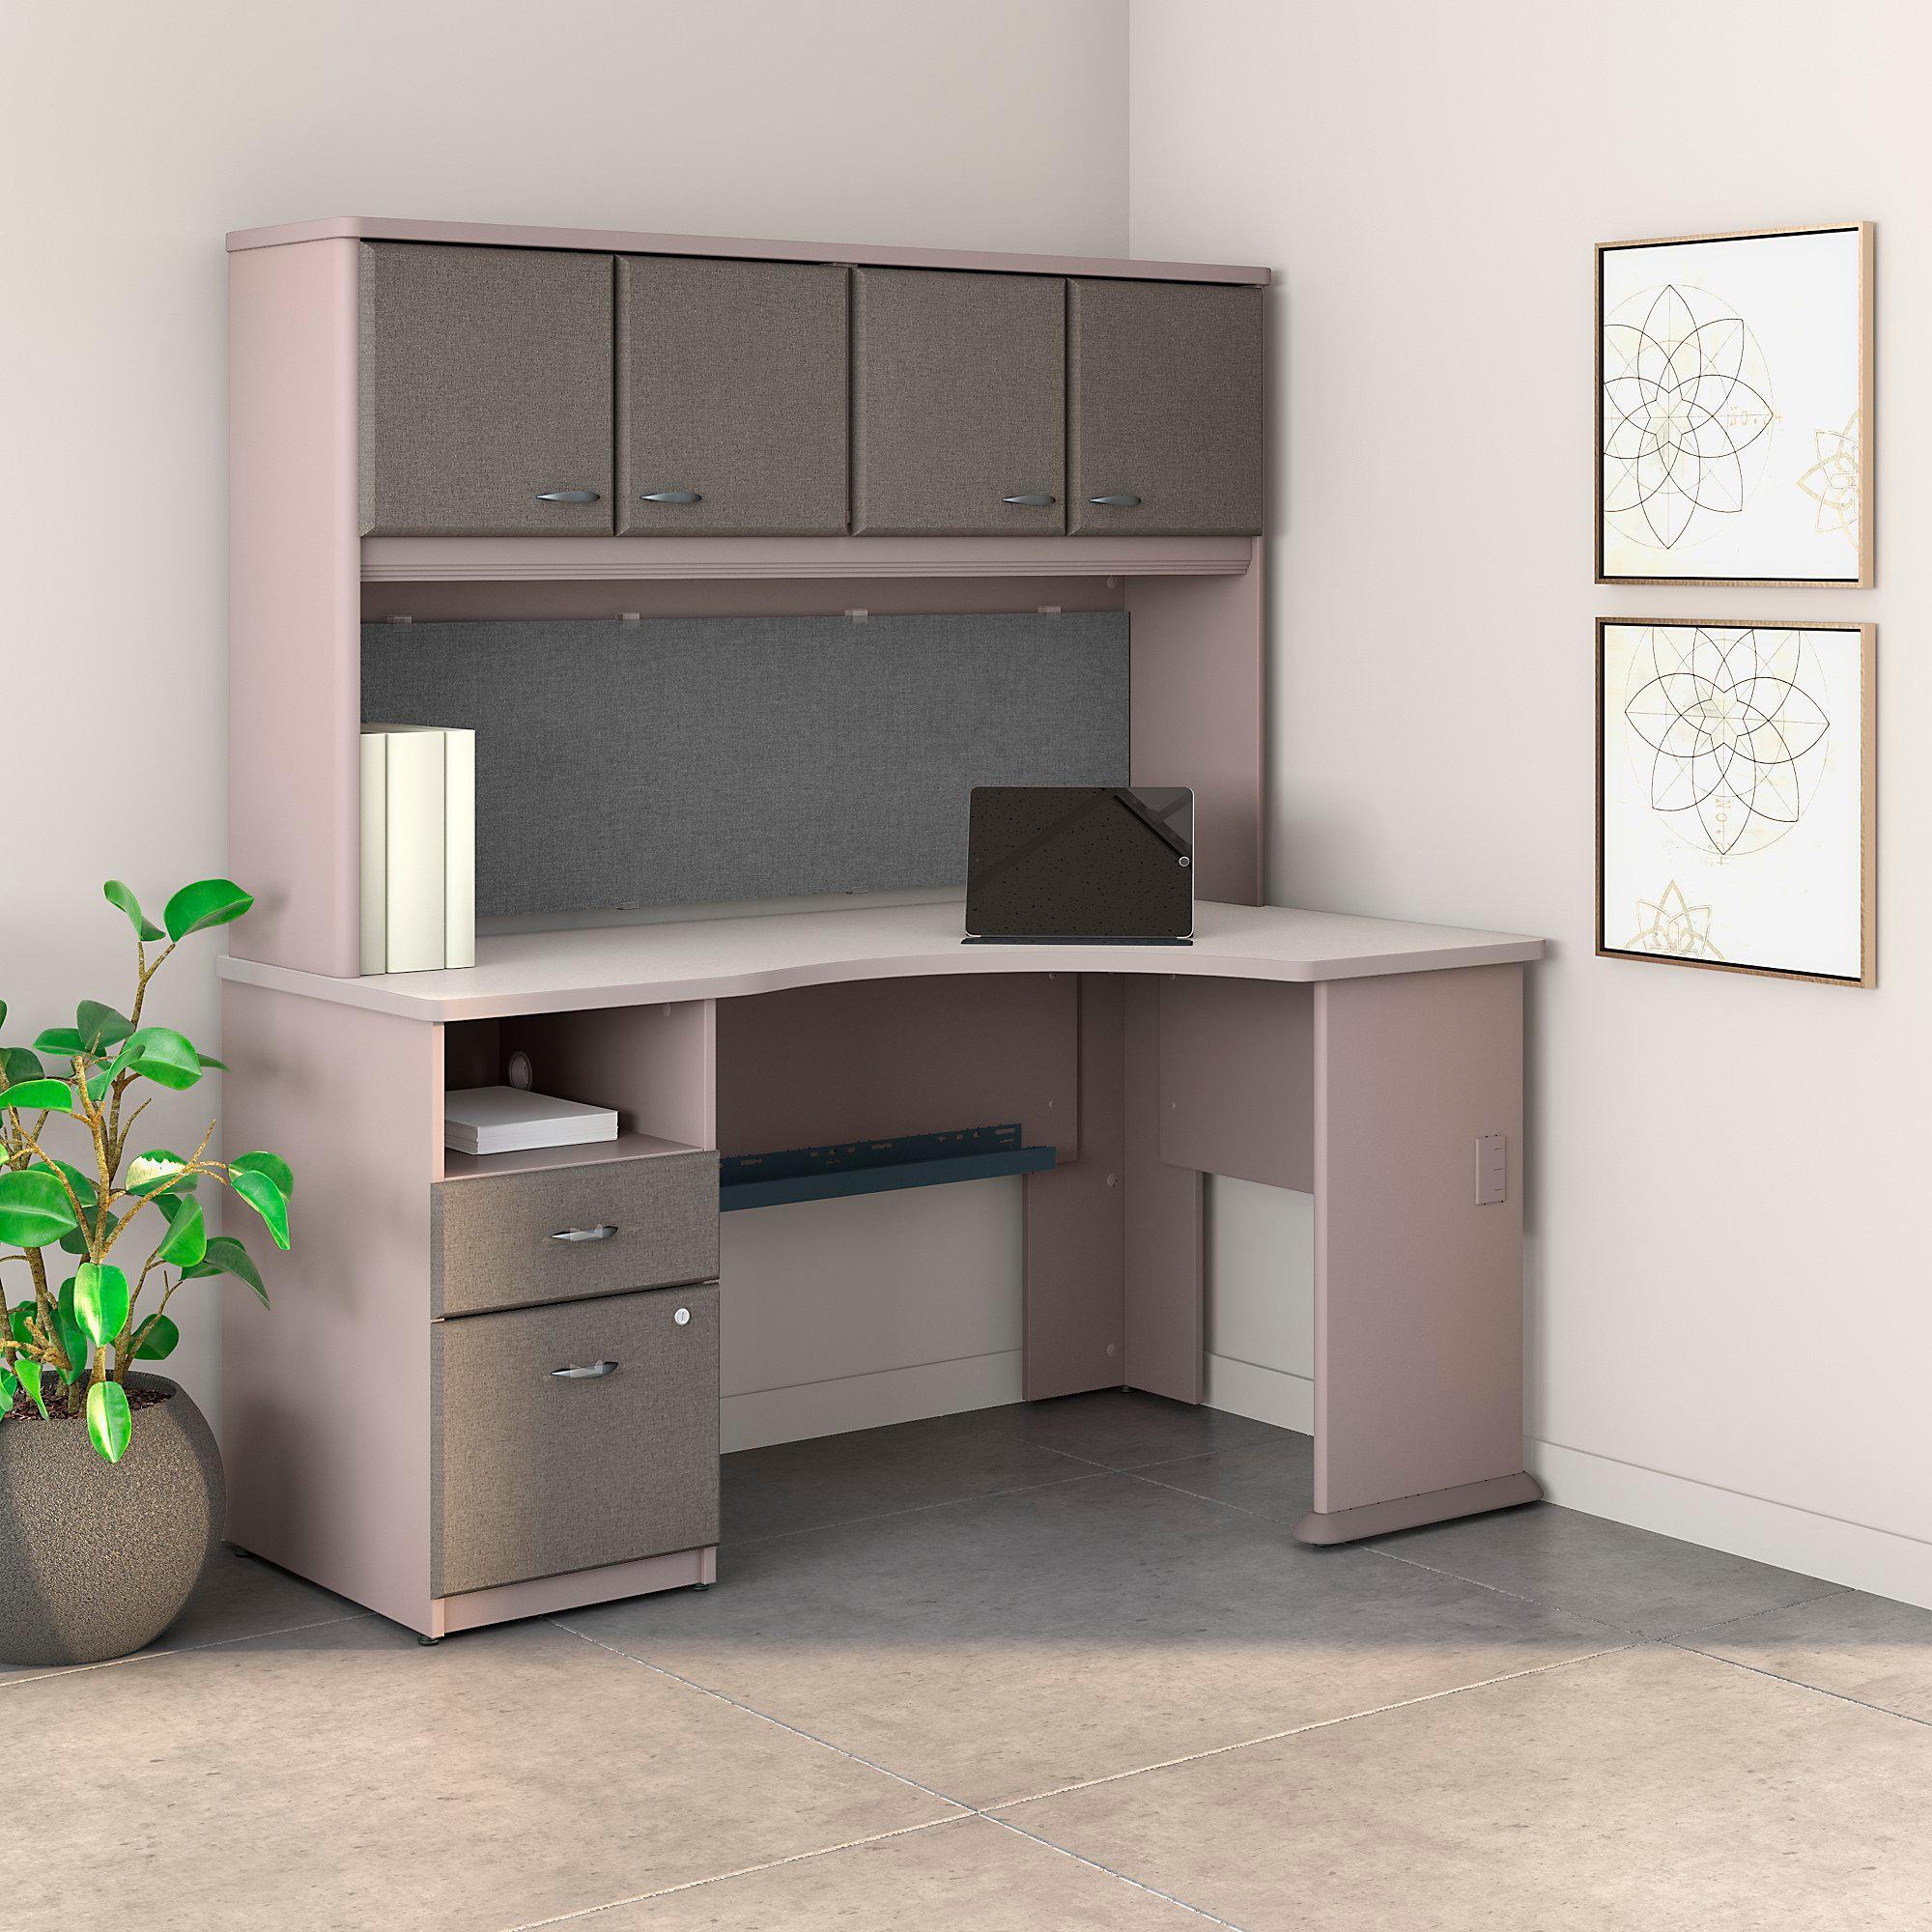 Kitchen Office Furniture: Amazon.com: Bush Business Furniture Series A 60W Corner